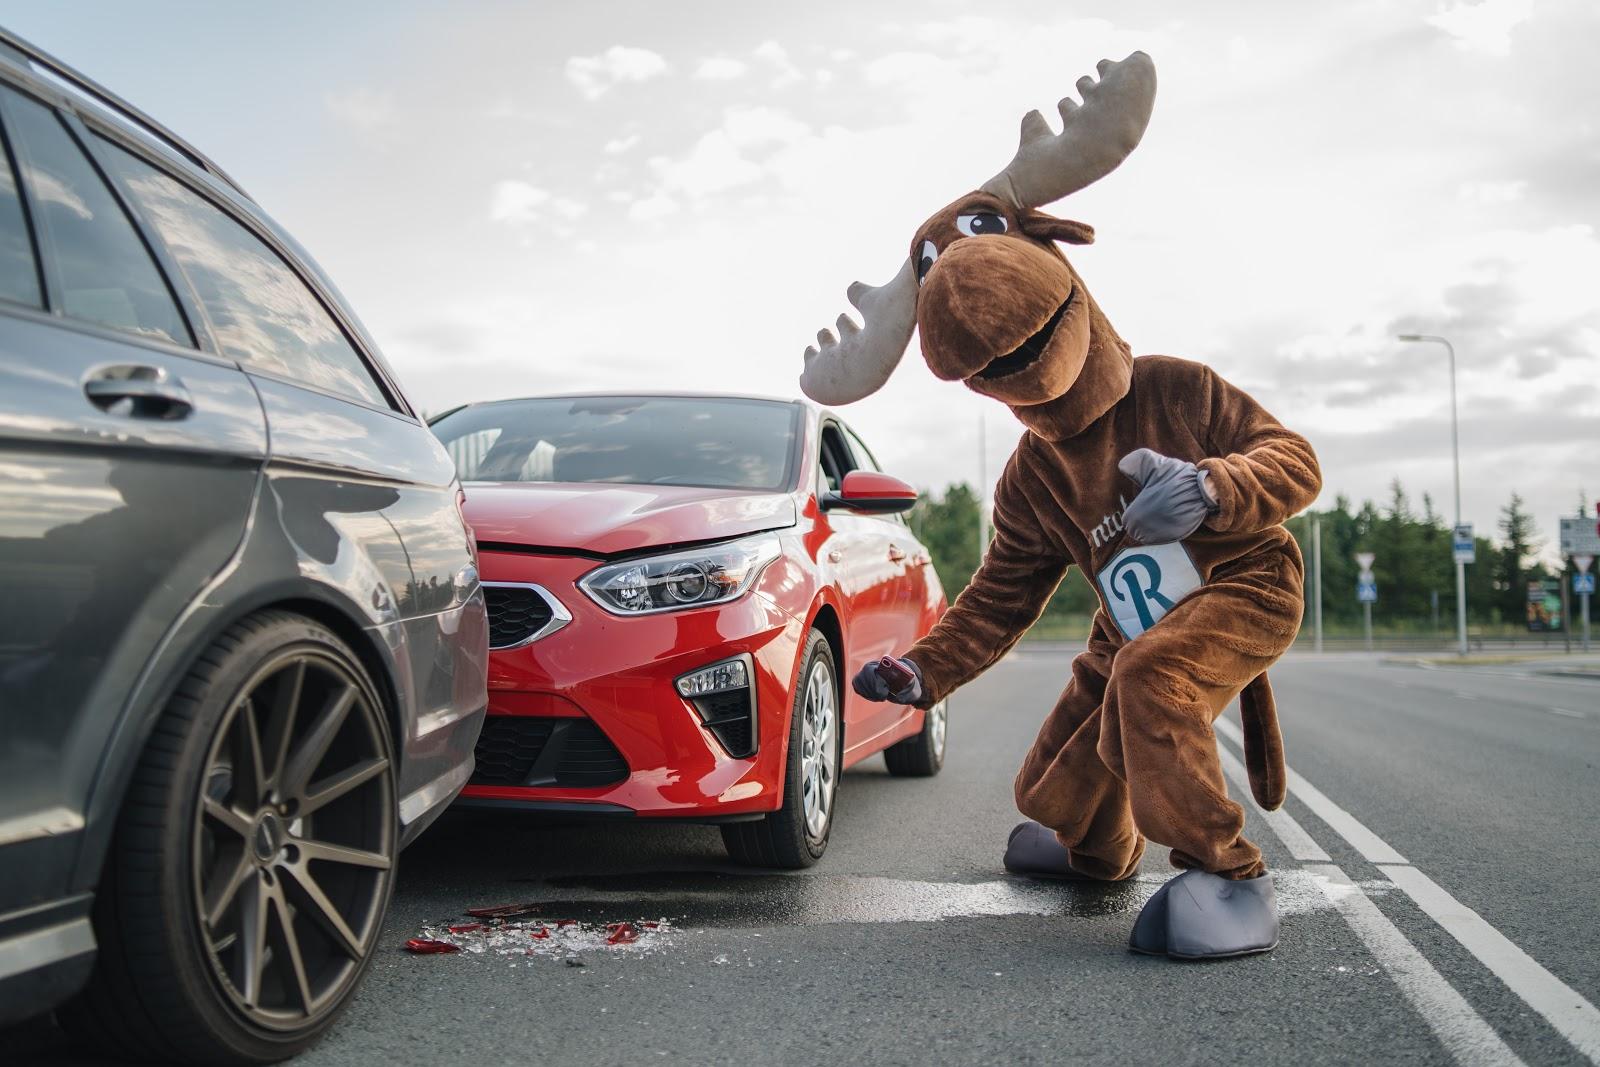 Rental Moose mascot photographs damaged red Kia Rental car. Make sure to gather proof if you crash a rental car.